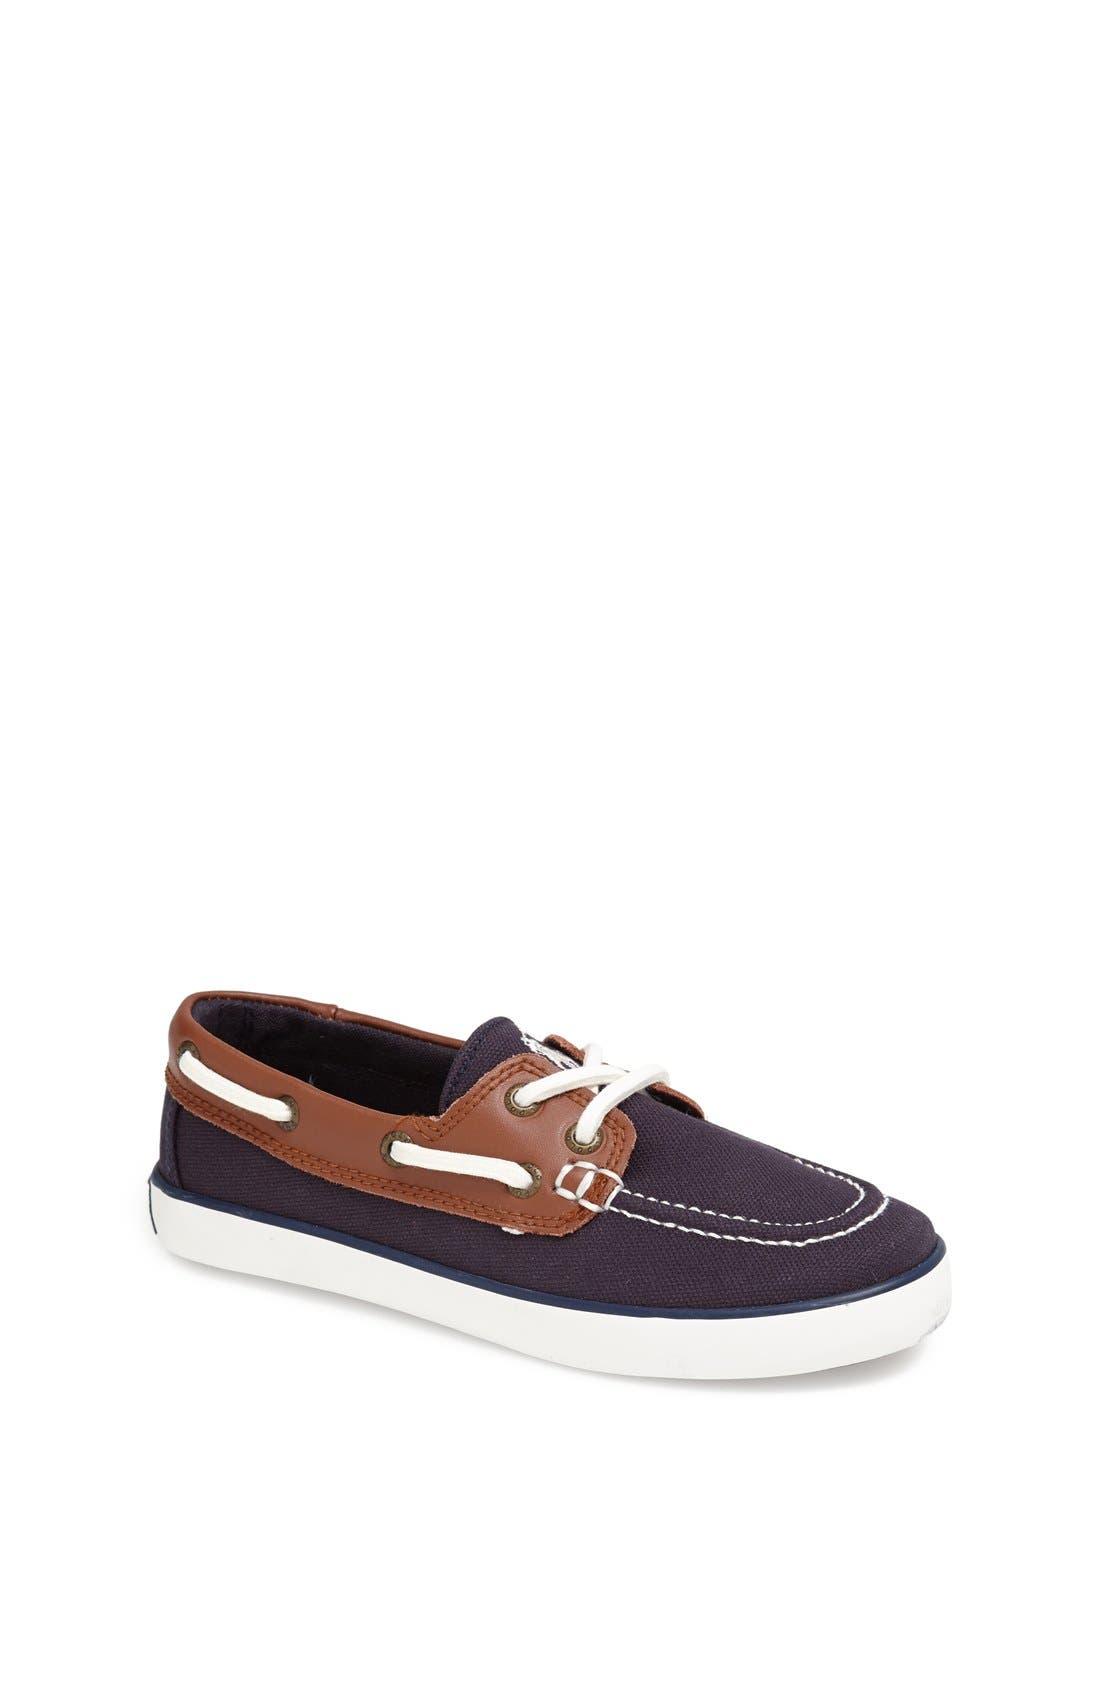 Ralph Lauren Sander Boat Shoe Toddler Little Kid & Big